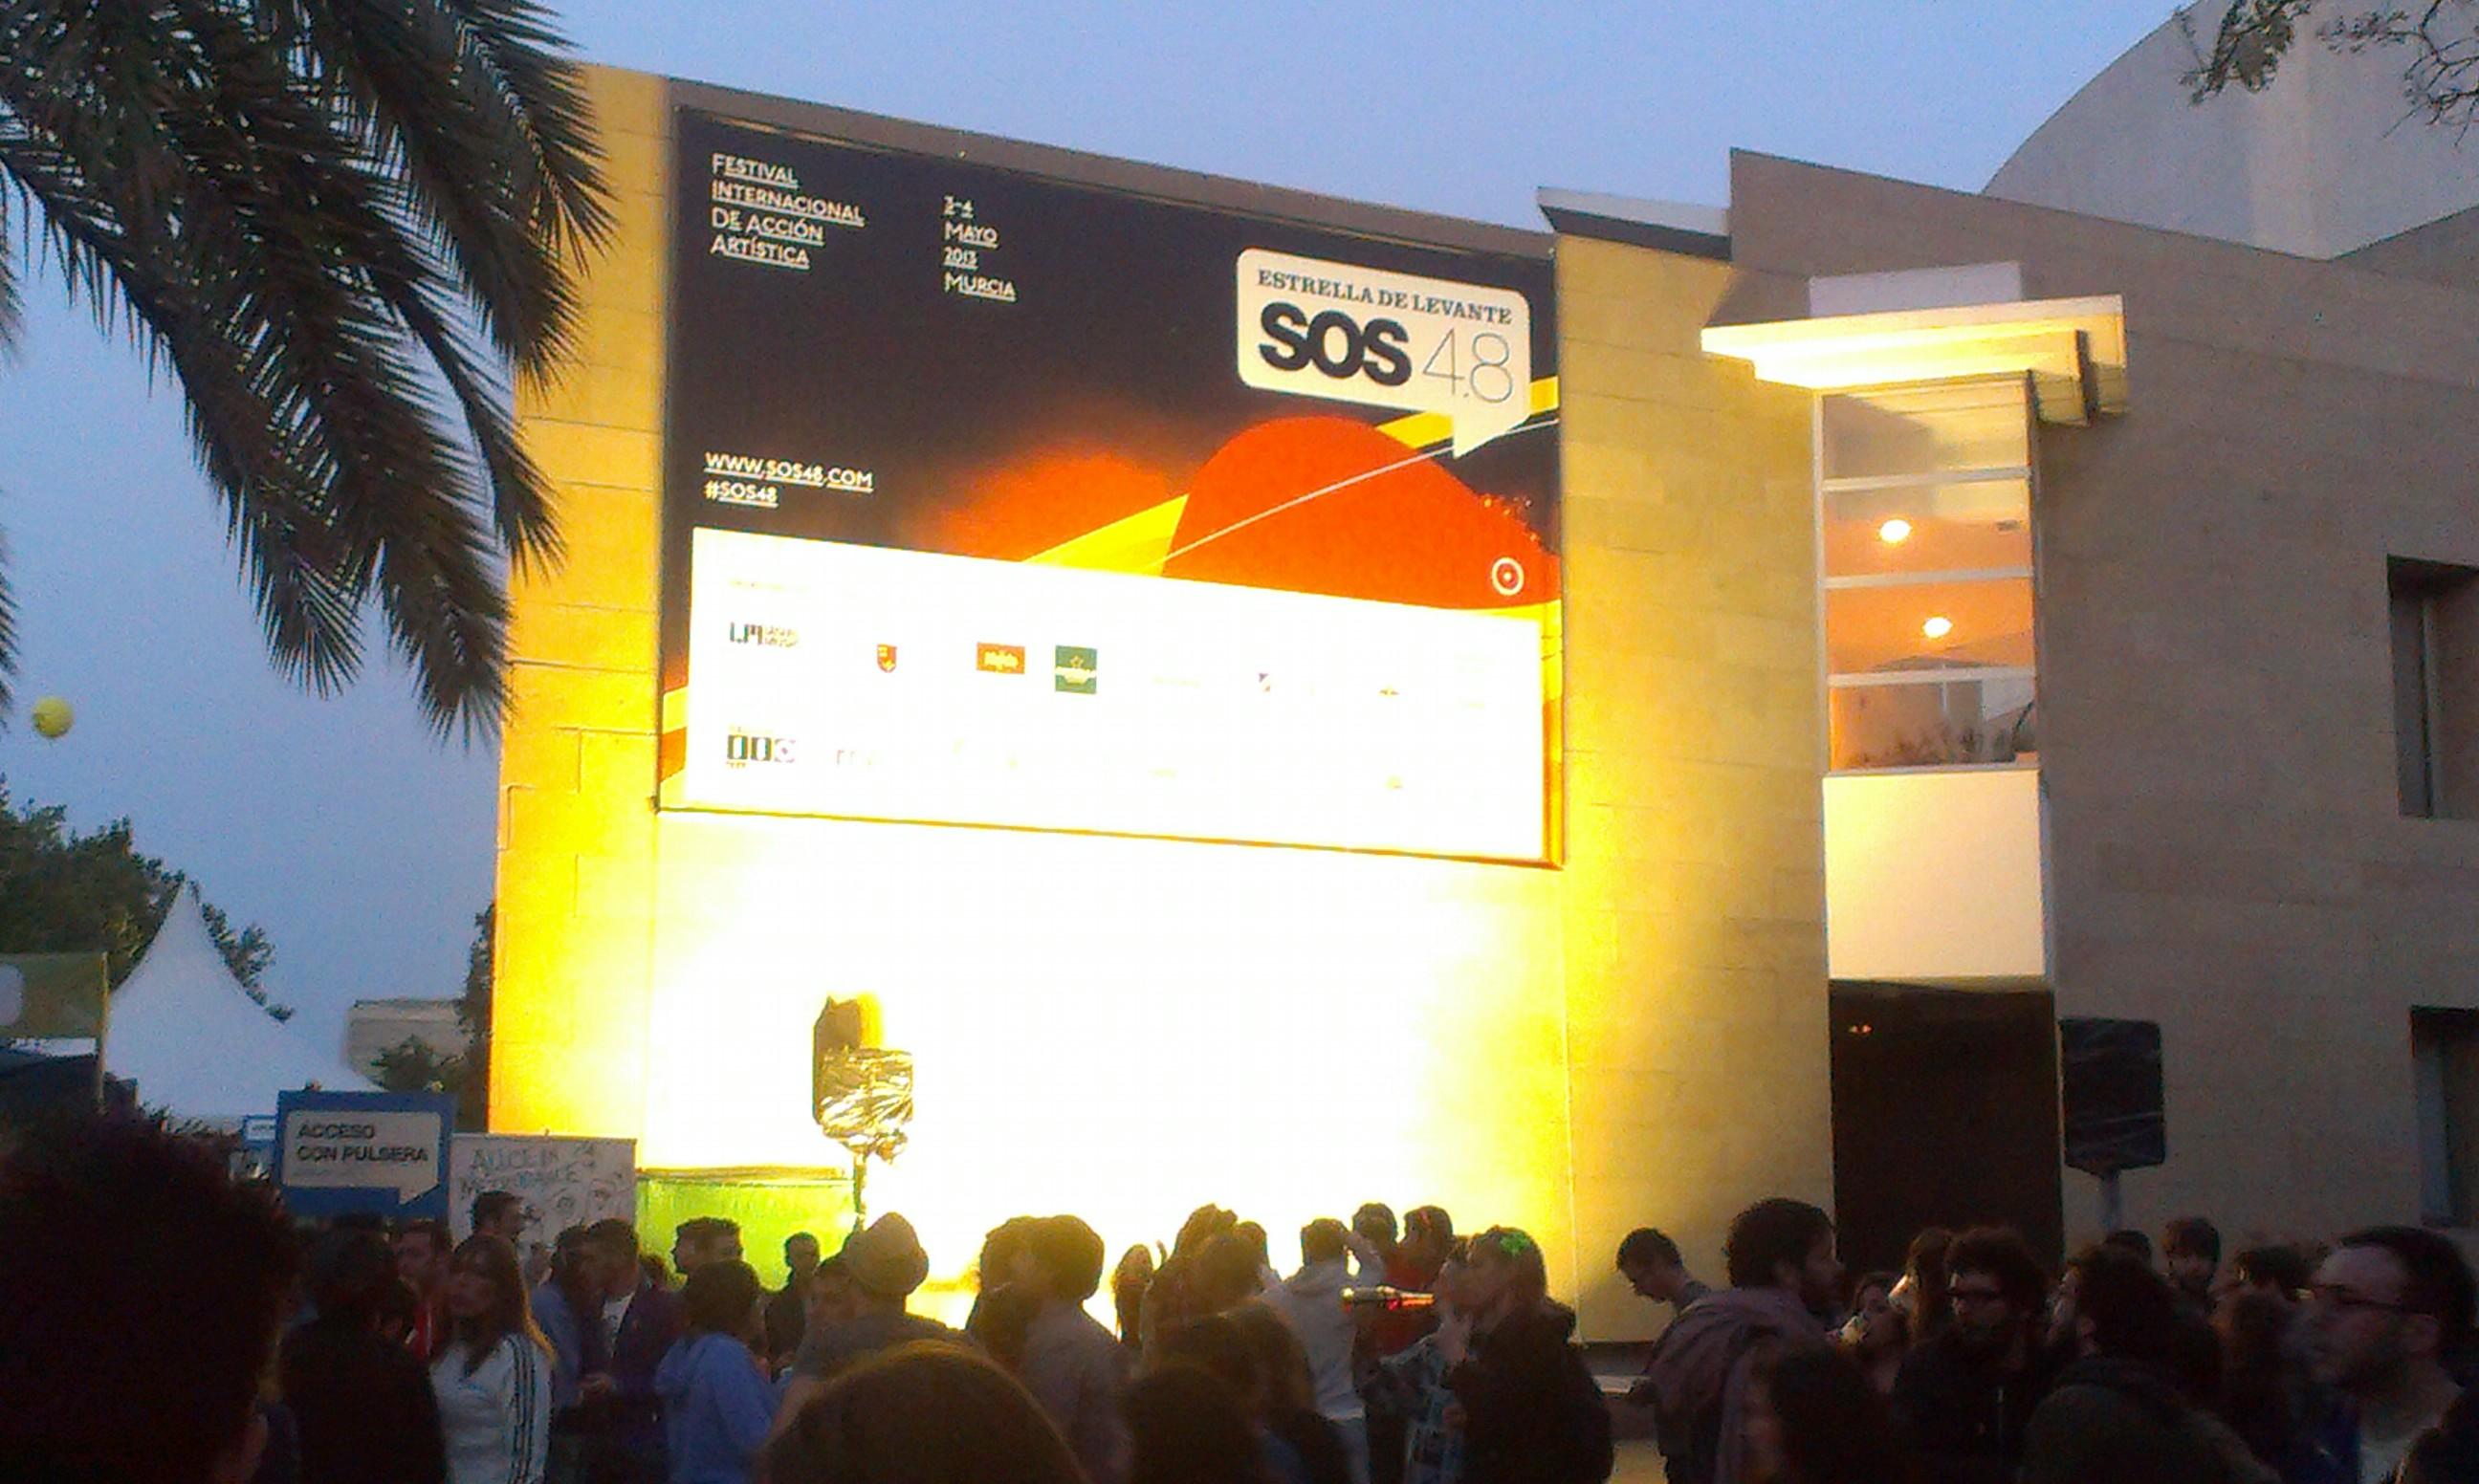 imag0168 SOS 4.8 Festival, Murcia